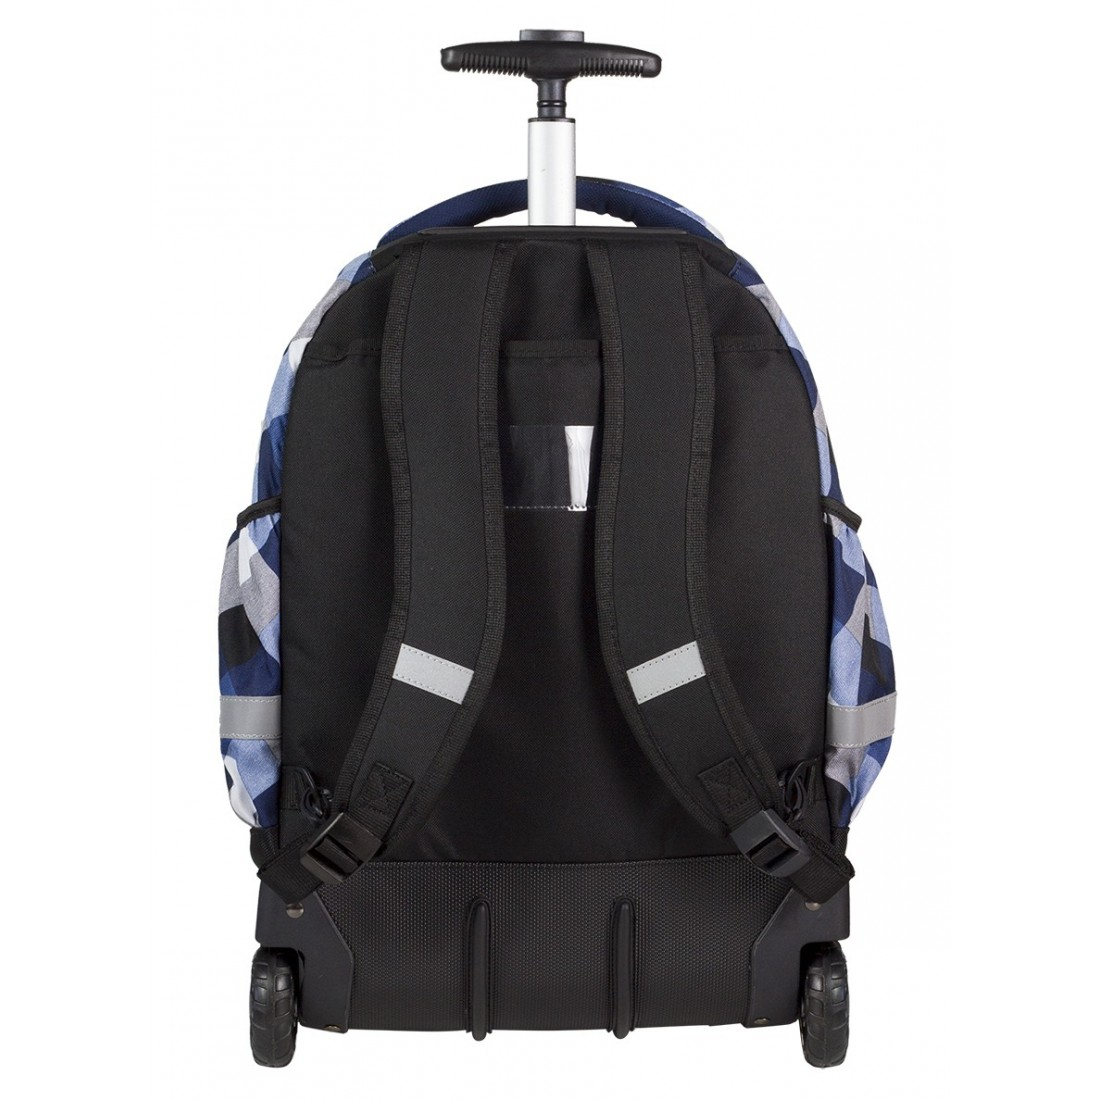 Plecak na kółkach CoolPack CP niebieski w kratkę RAPID CAMBRIDGE CP 466 - plecak-tornister.pl